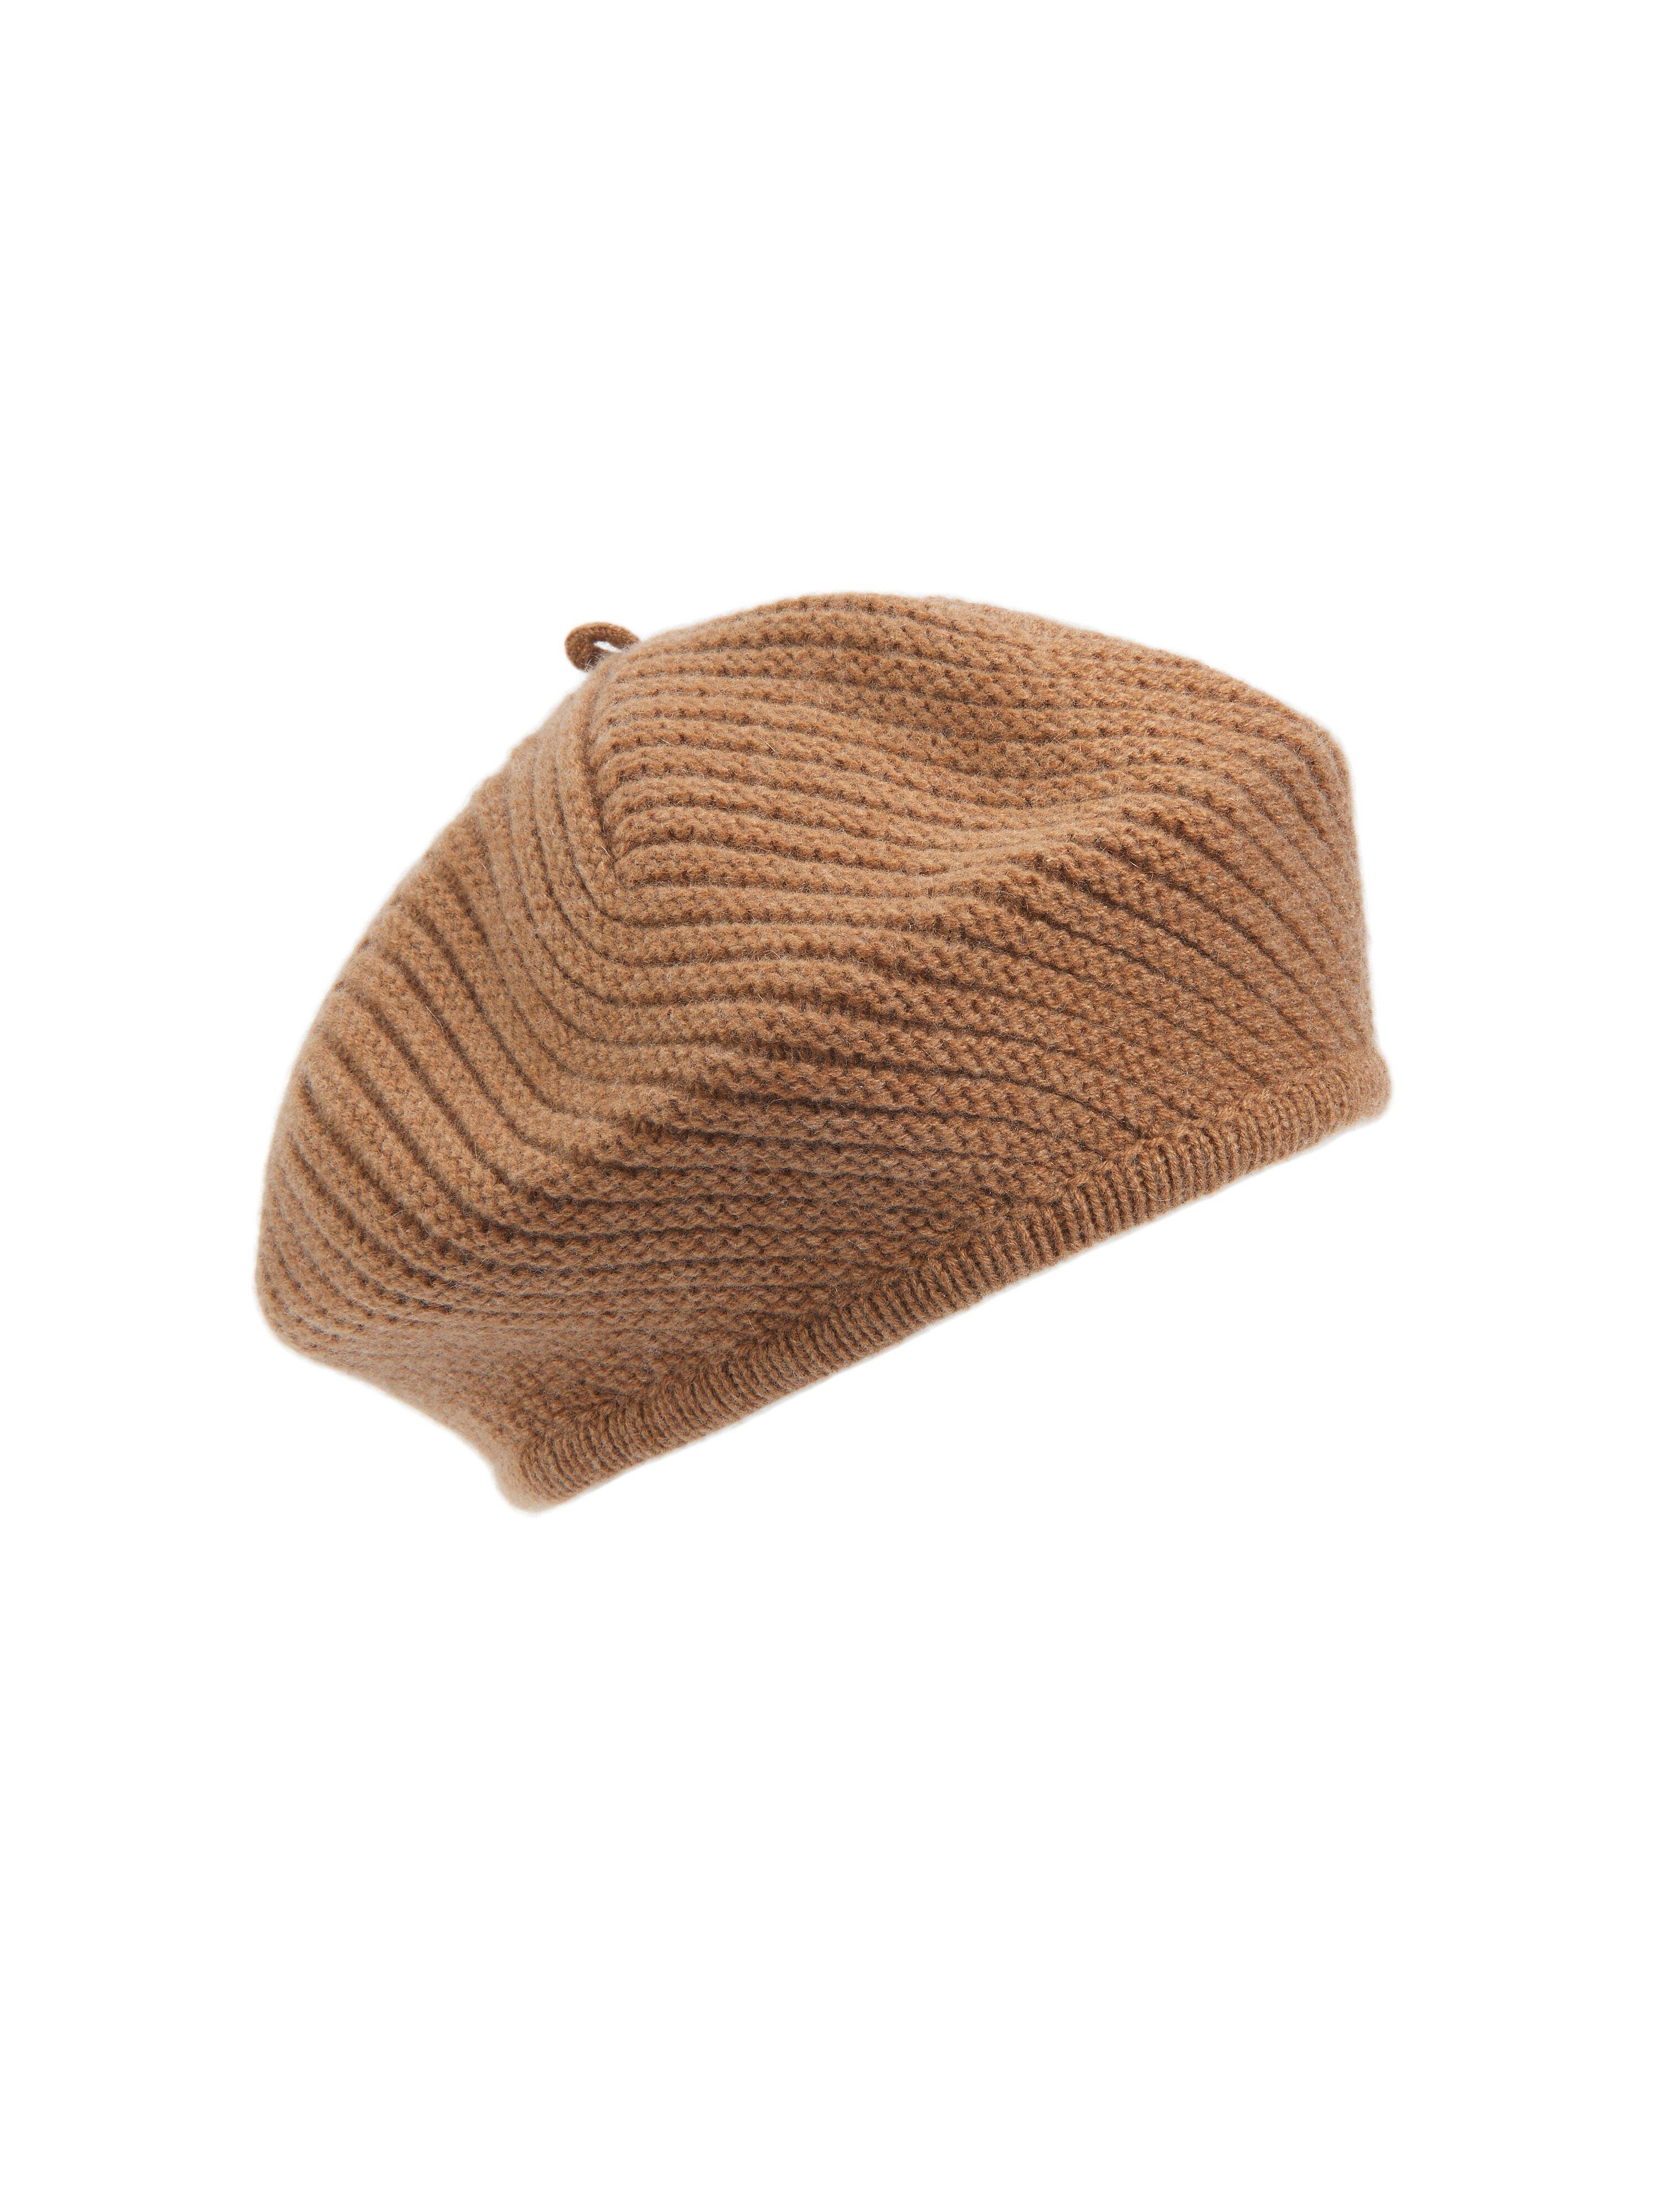 peter hahn cashmere - Baskenmütze aus 100% Premium Kaschmir  braun